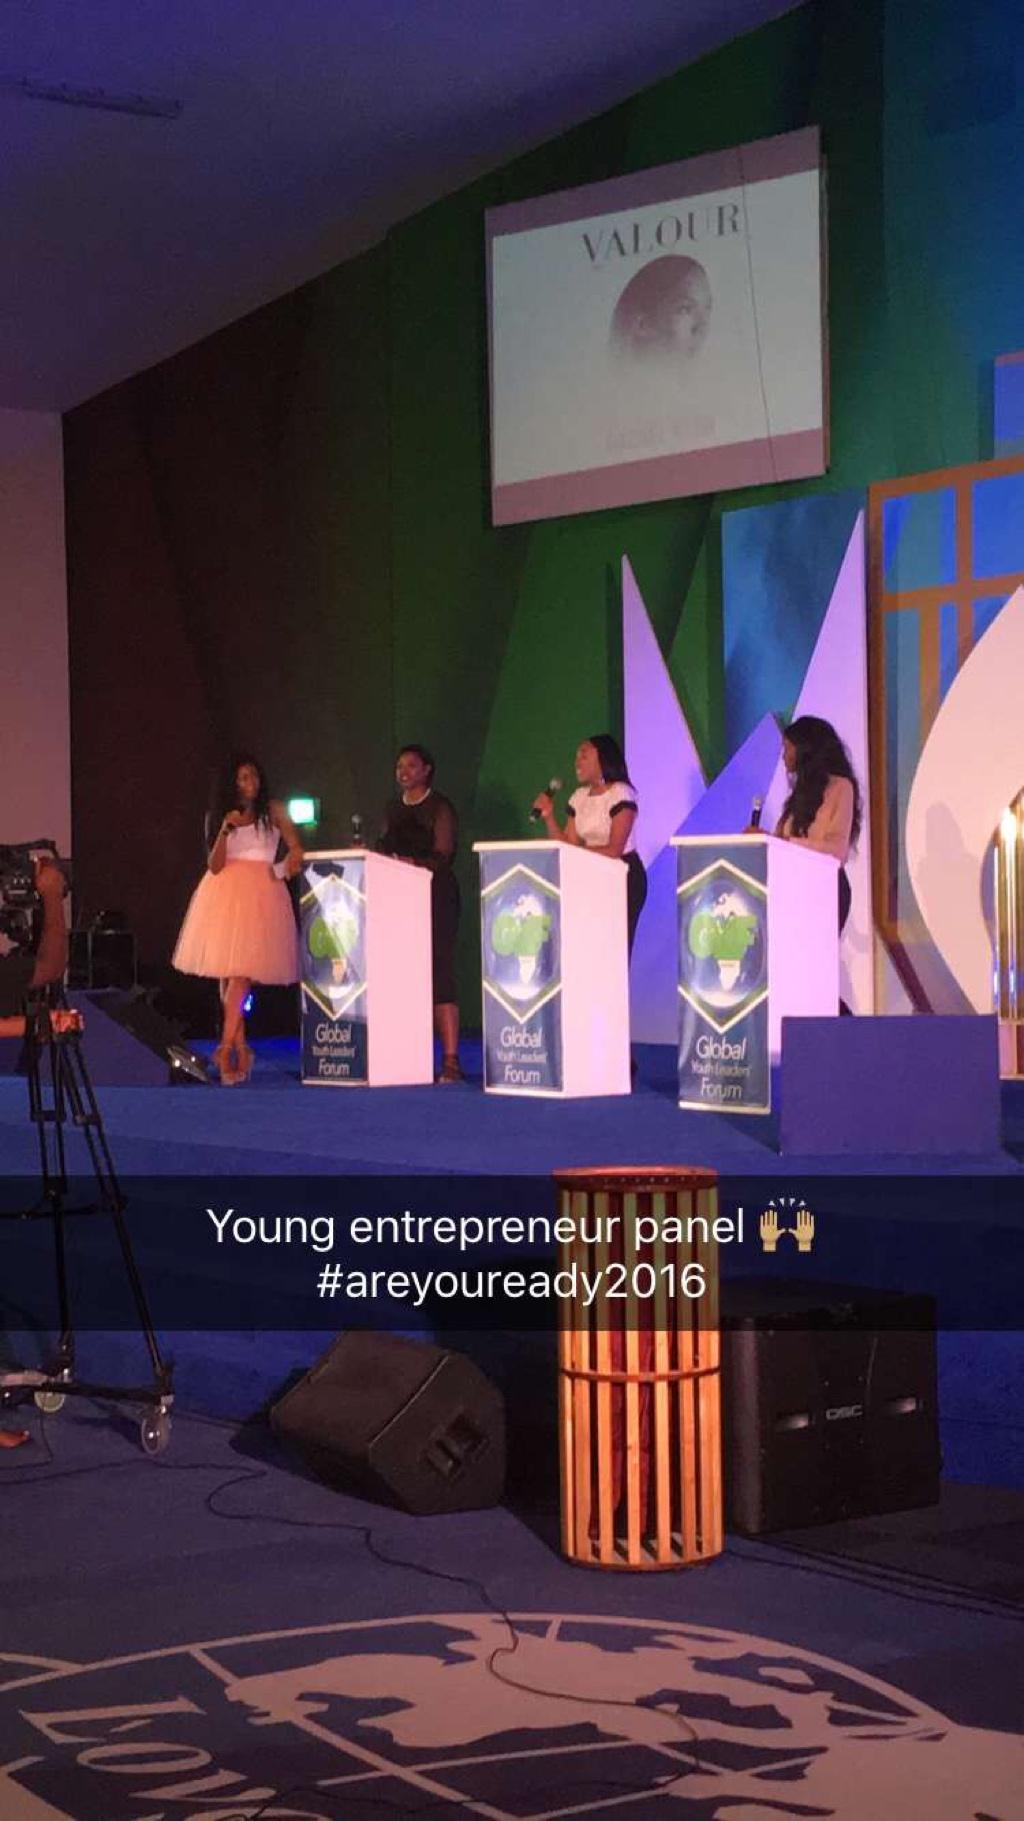 Now in progress young entrepreneurs